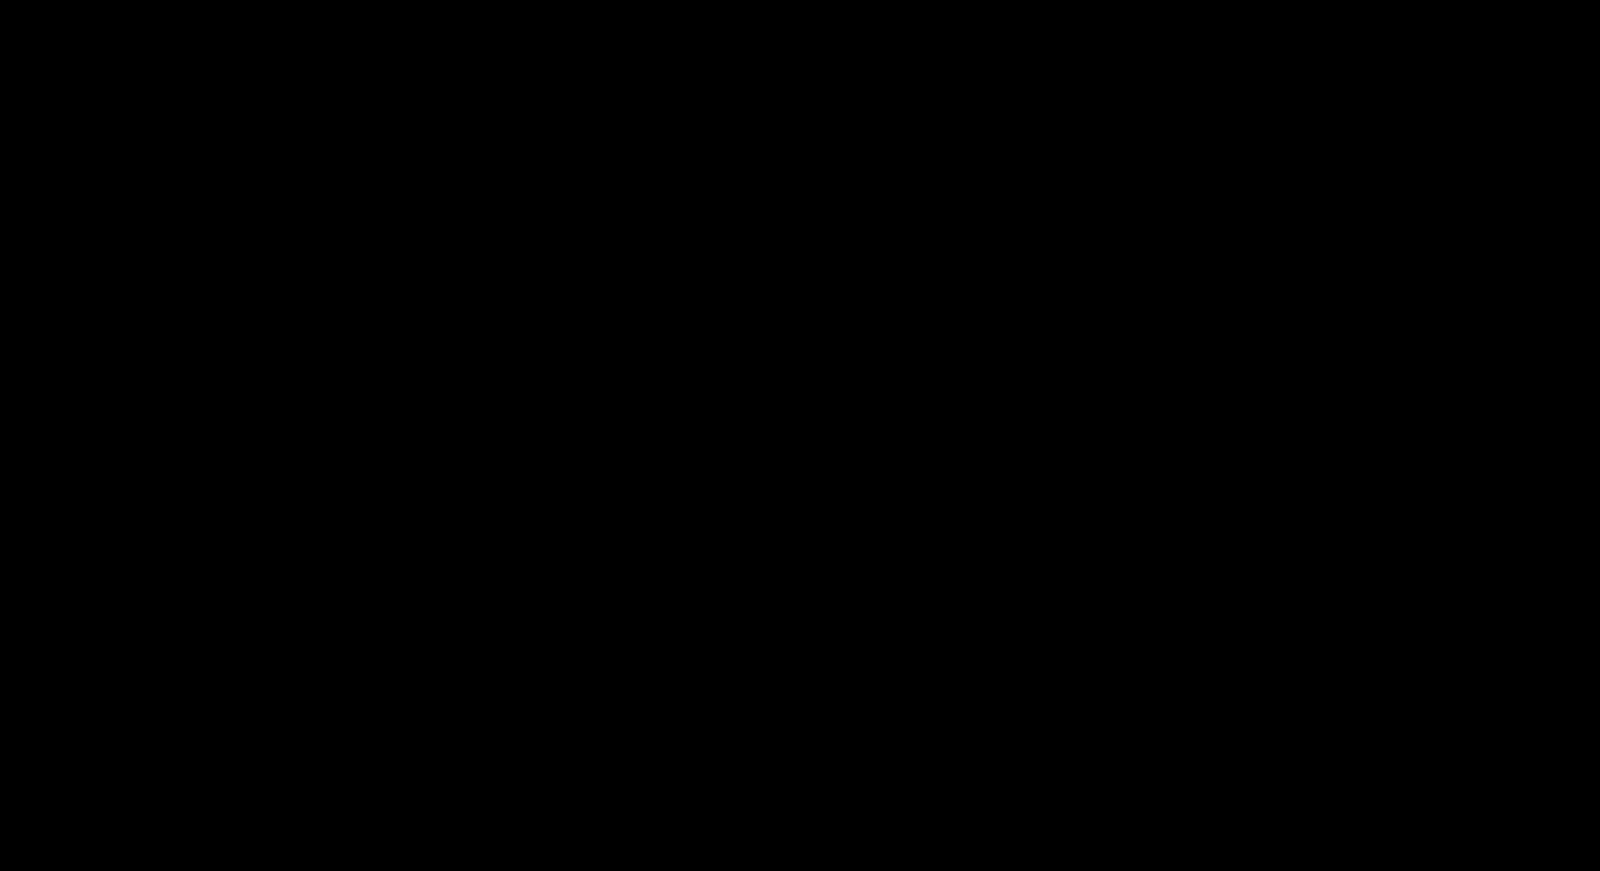 cm-01